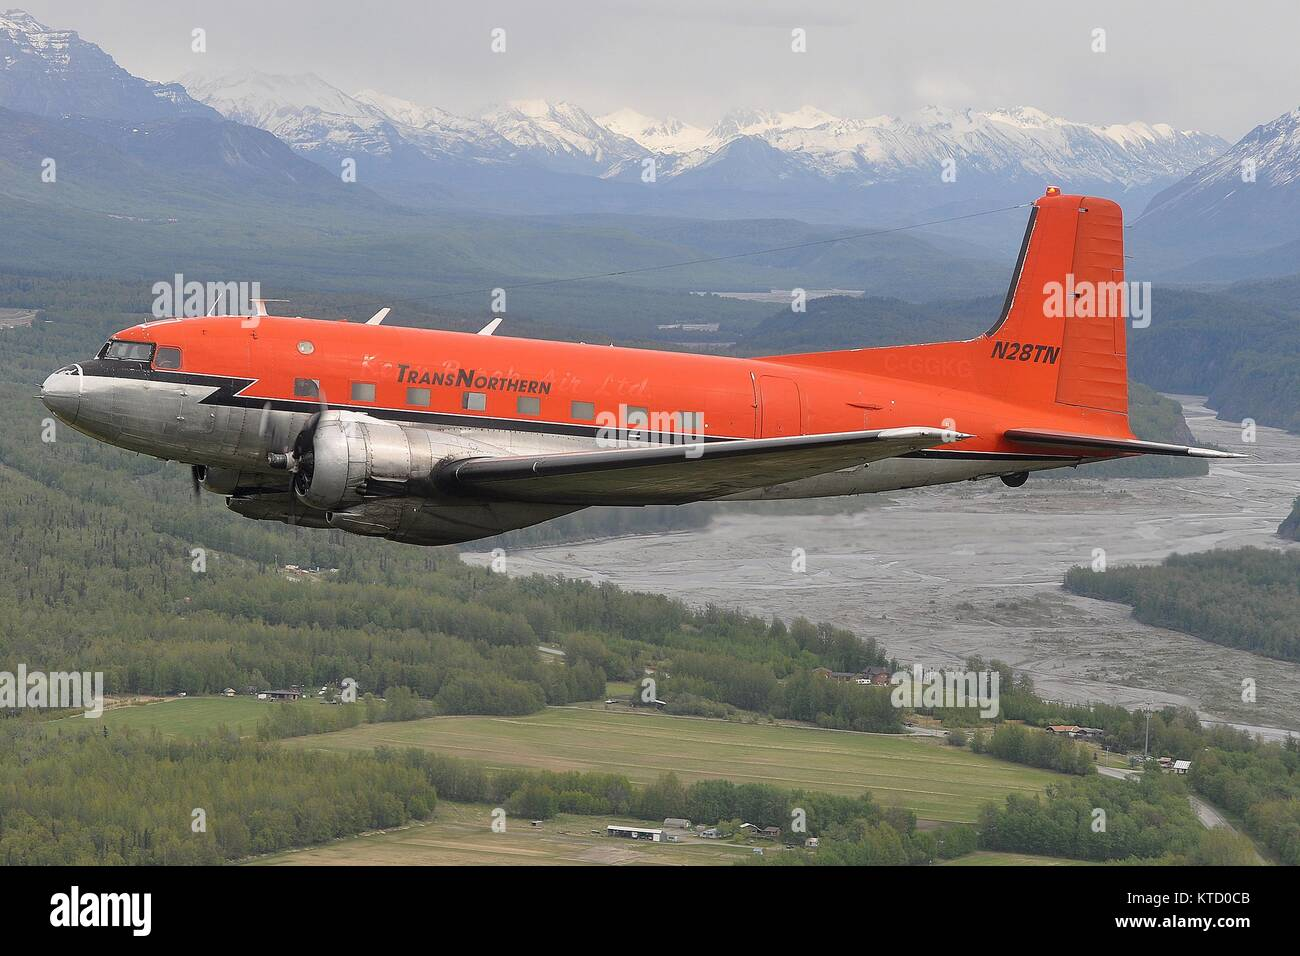 TRANSNORTHERN AVIATION DOUGLAS C-117D N28TN NEAR PALMER, ALASKA. - Stock Image